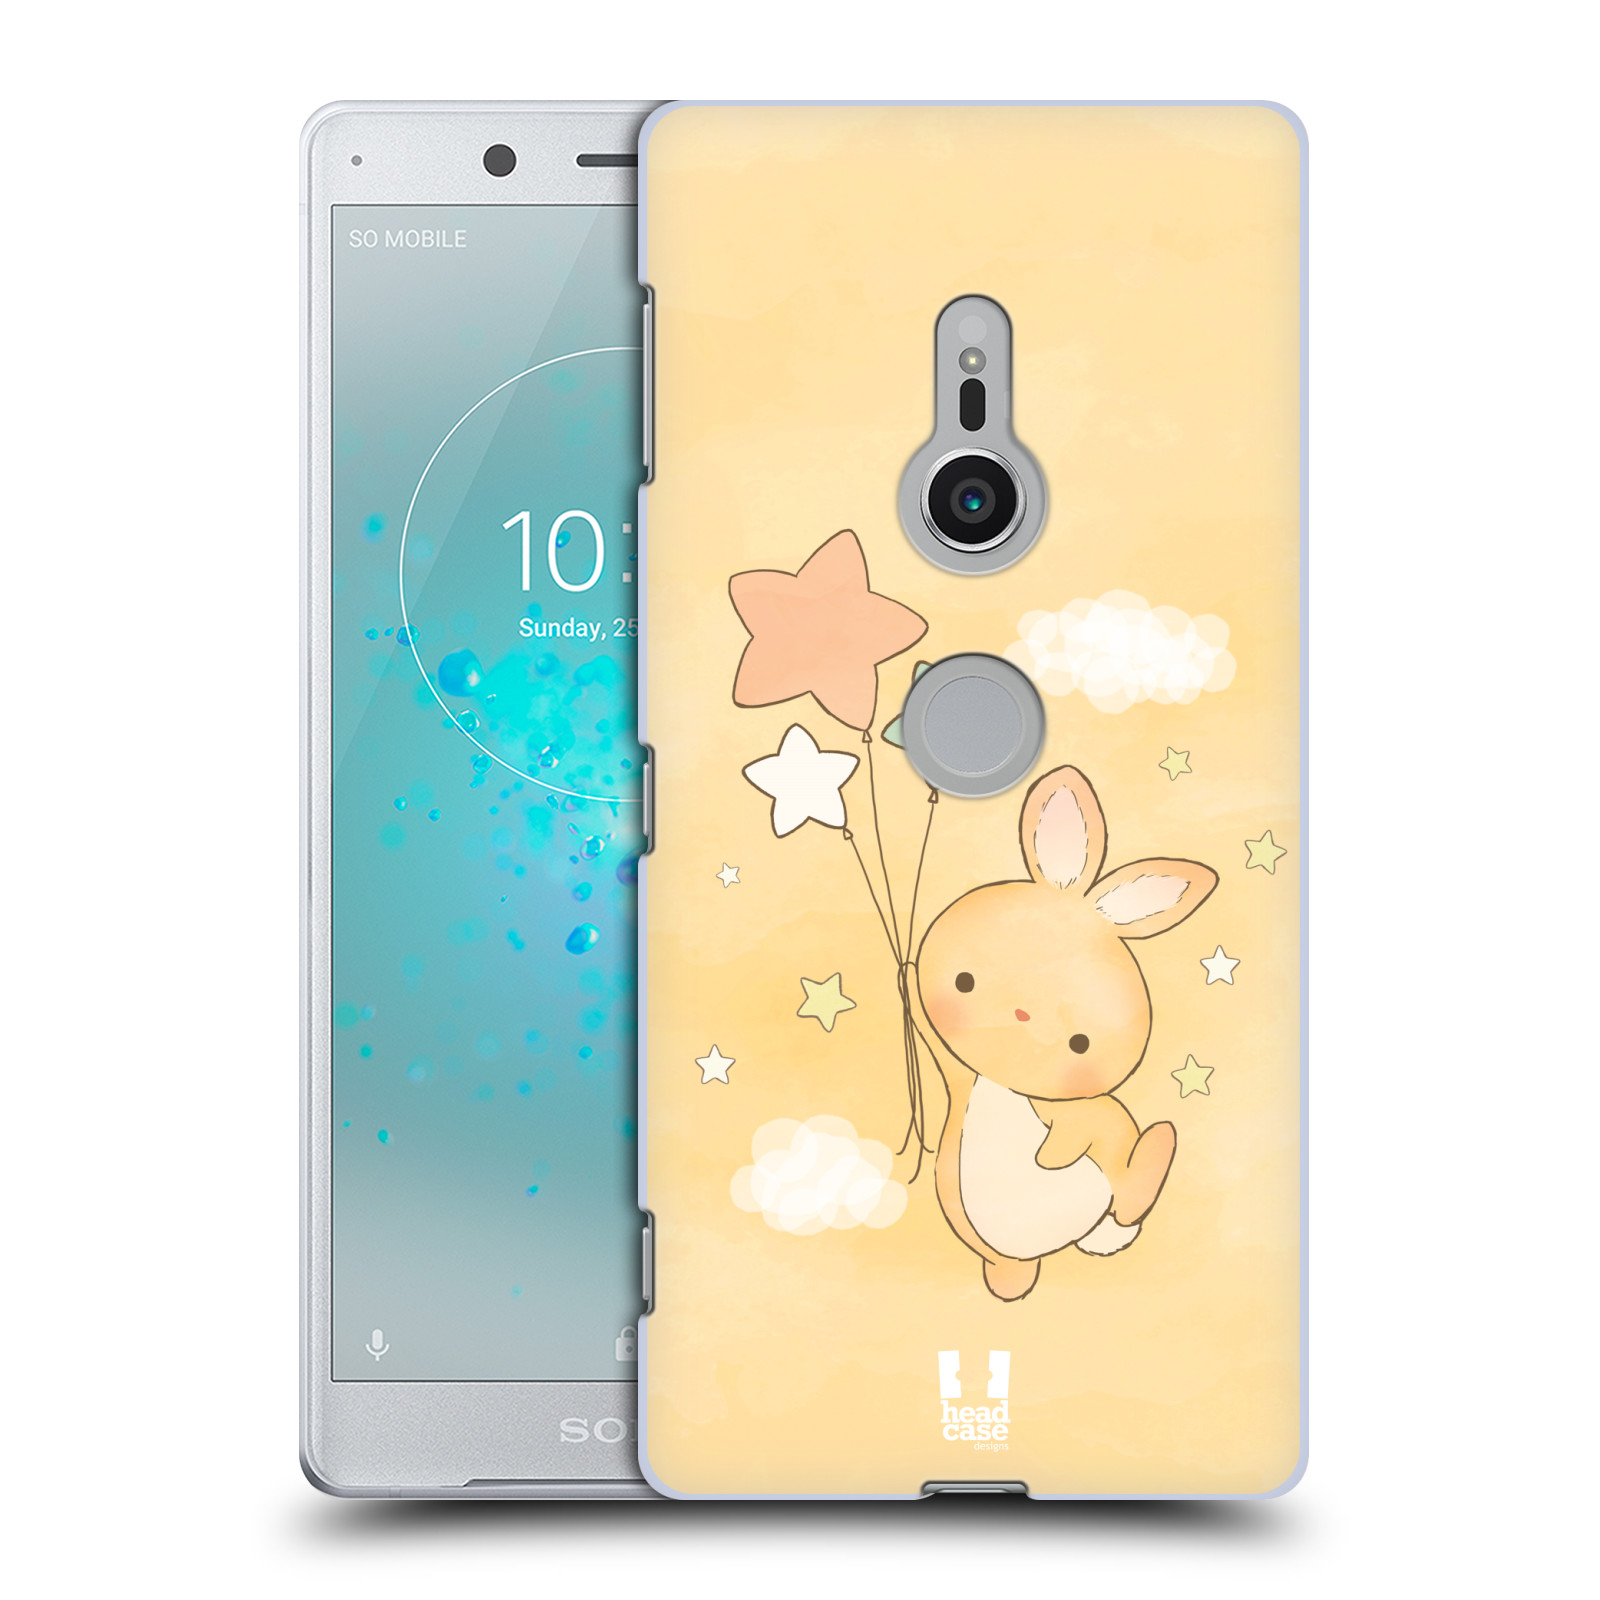 HEAD CASE plastový obal na mobil Sony Xperia XZ2 vzor králíček a hvězdy žlutá